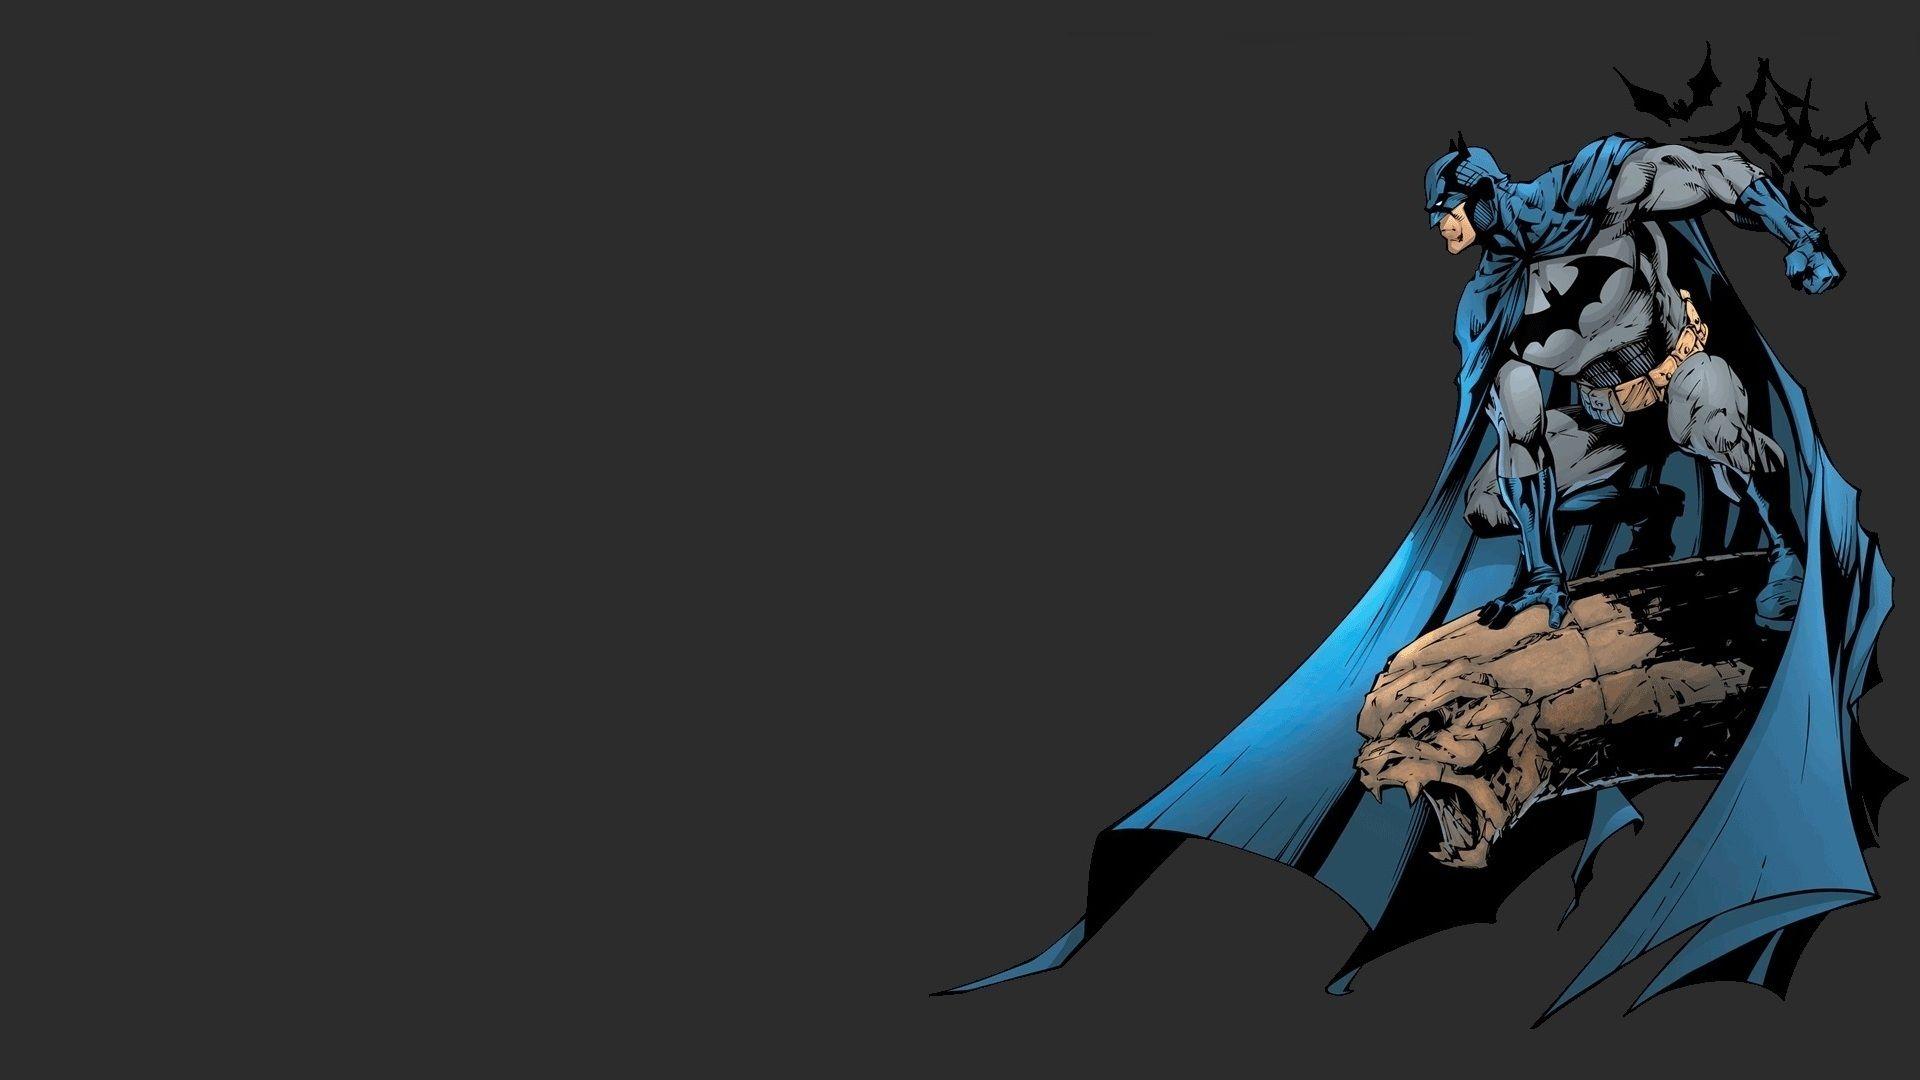 Dc Comics Hd Wallpapers Backgrounds Wallpaper Batman Cartoon Batman Comic Wallpaper Batman Comics